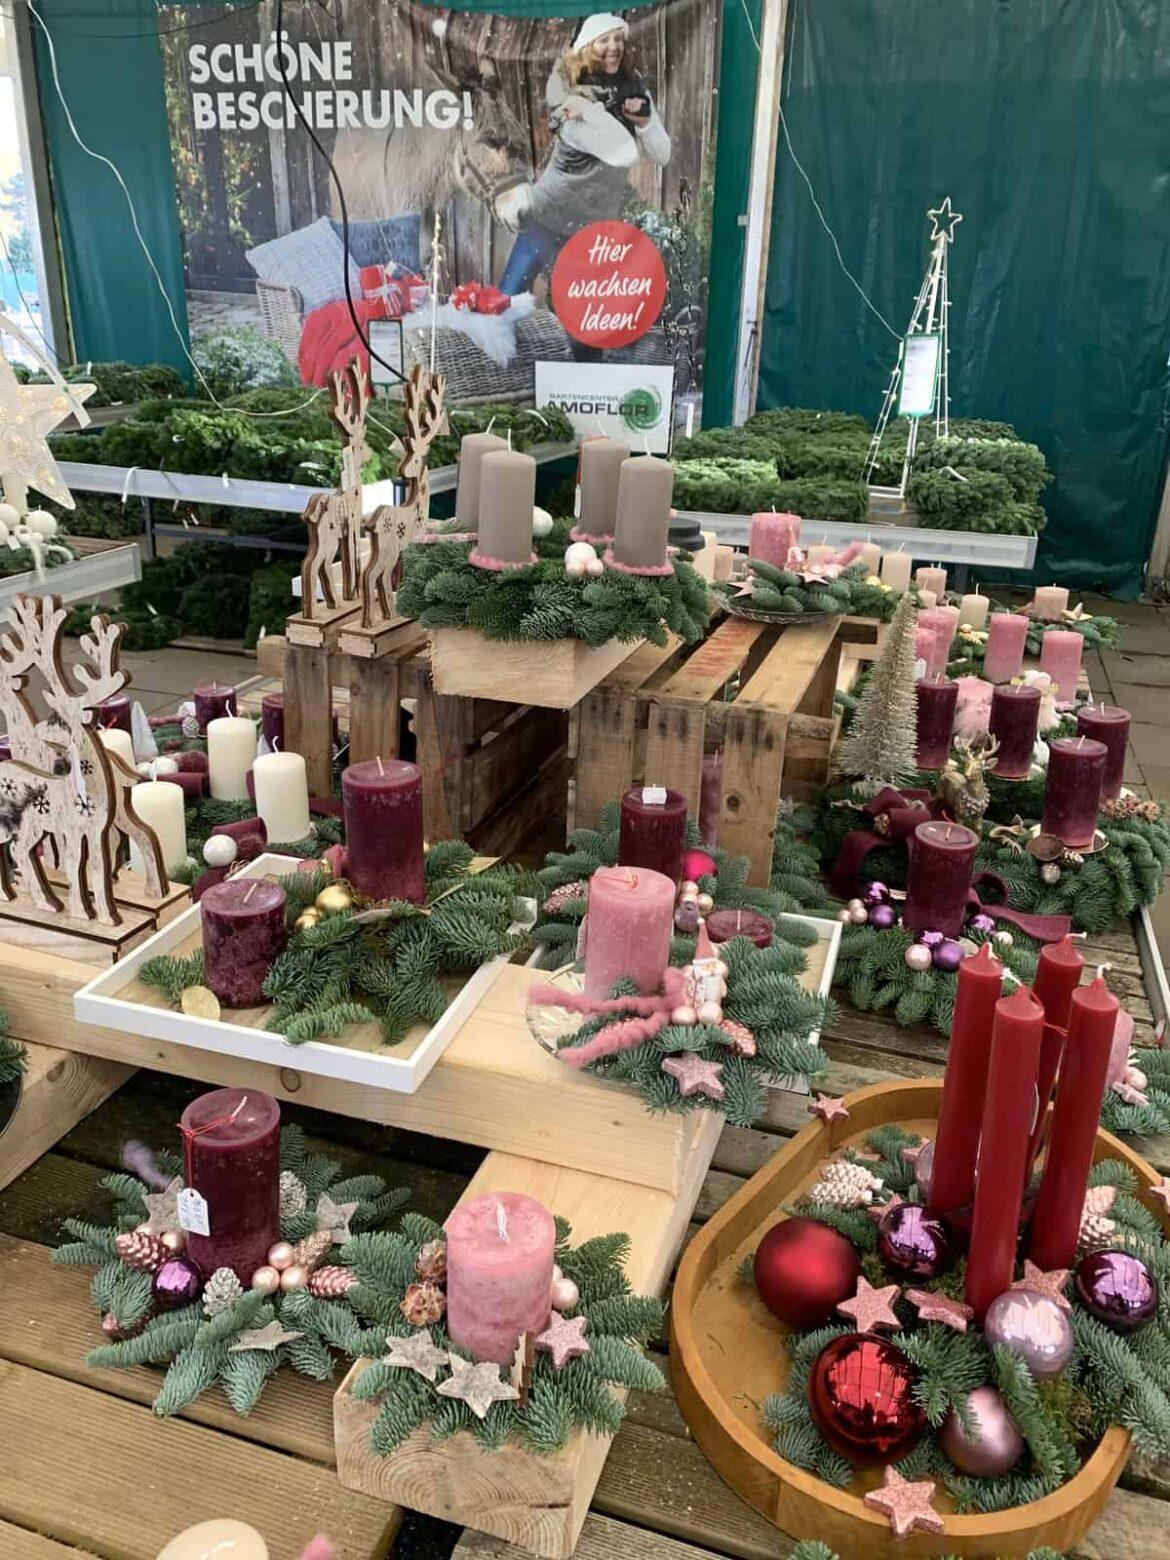 Adventszauber im Gartencenter Amoflor